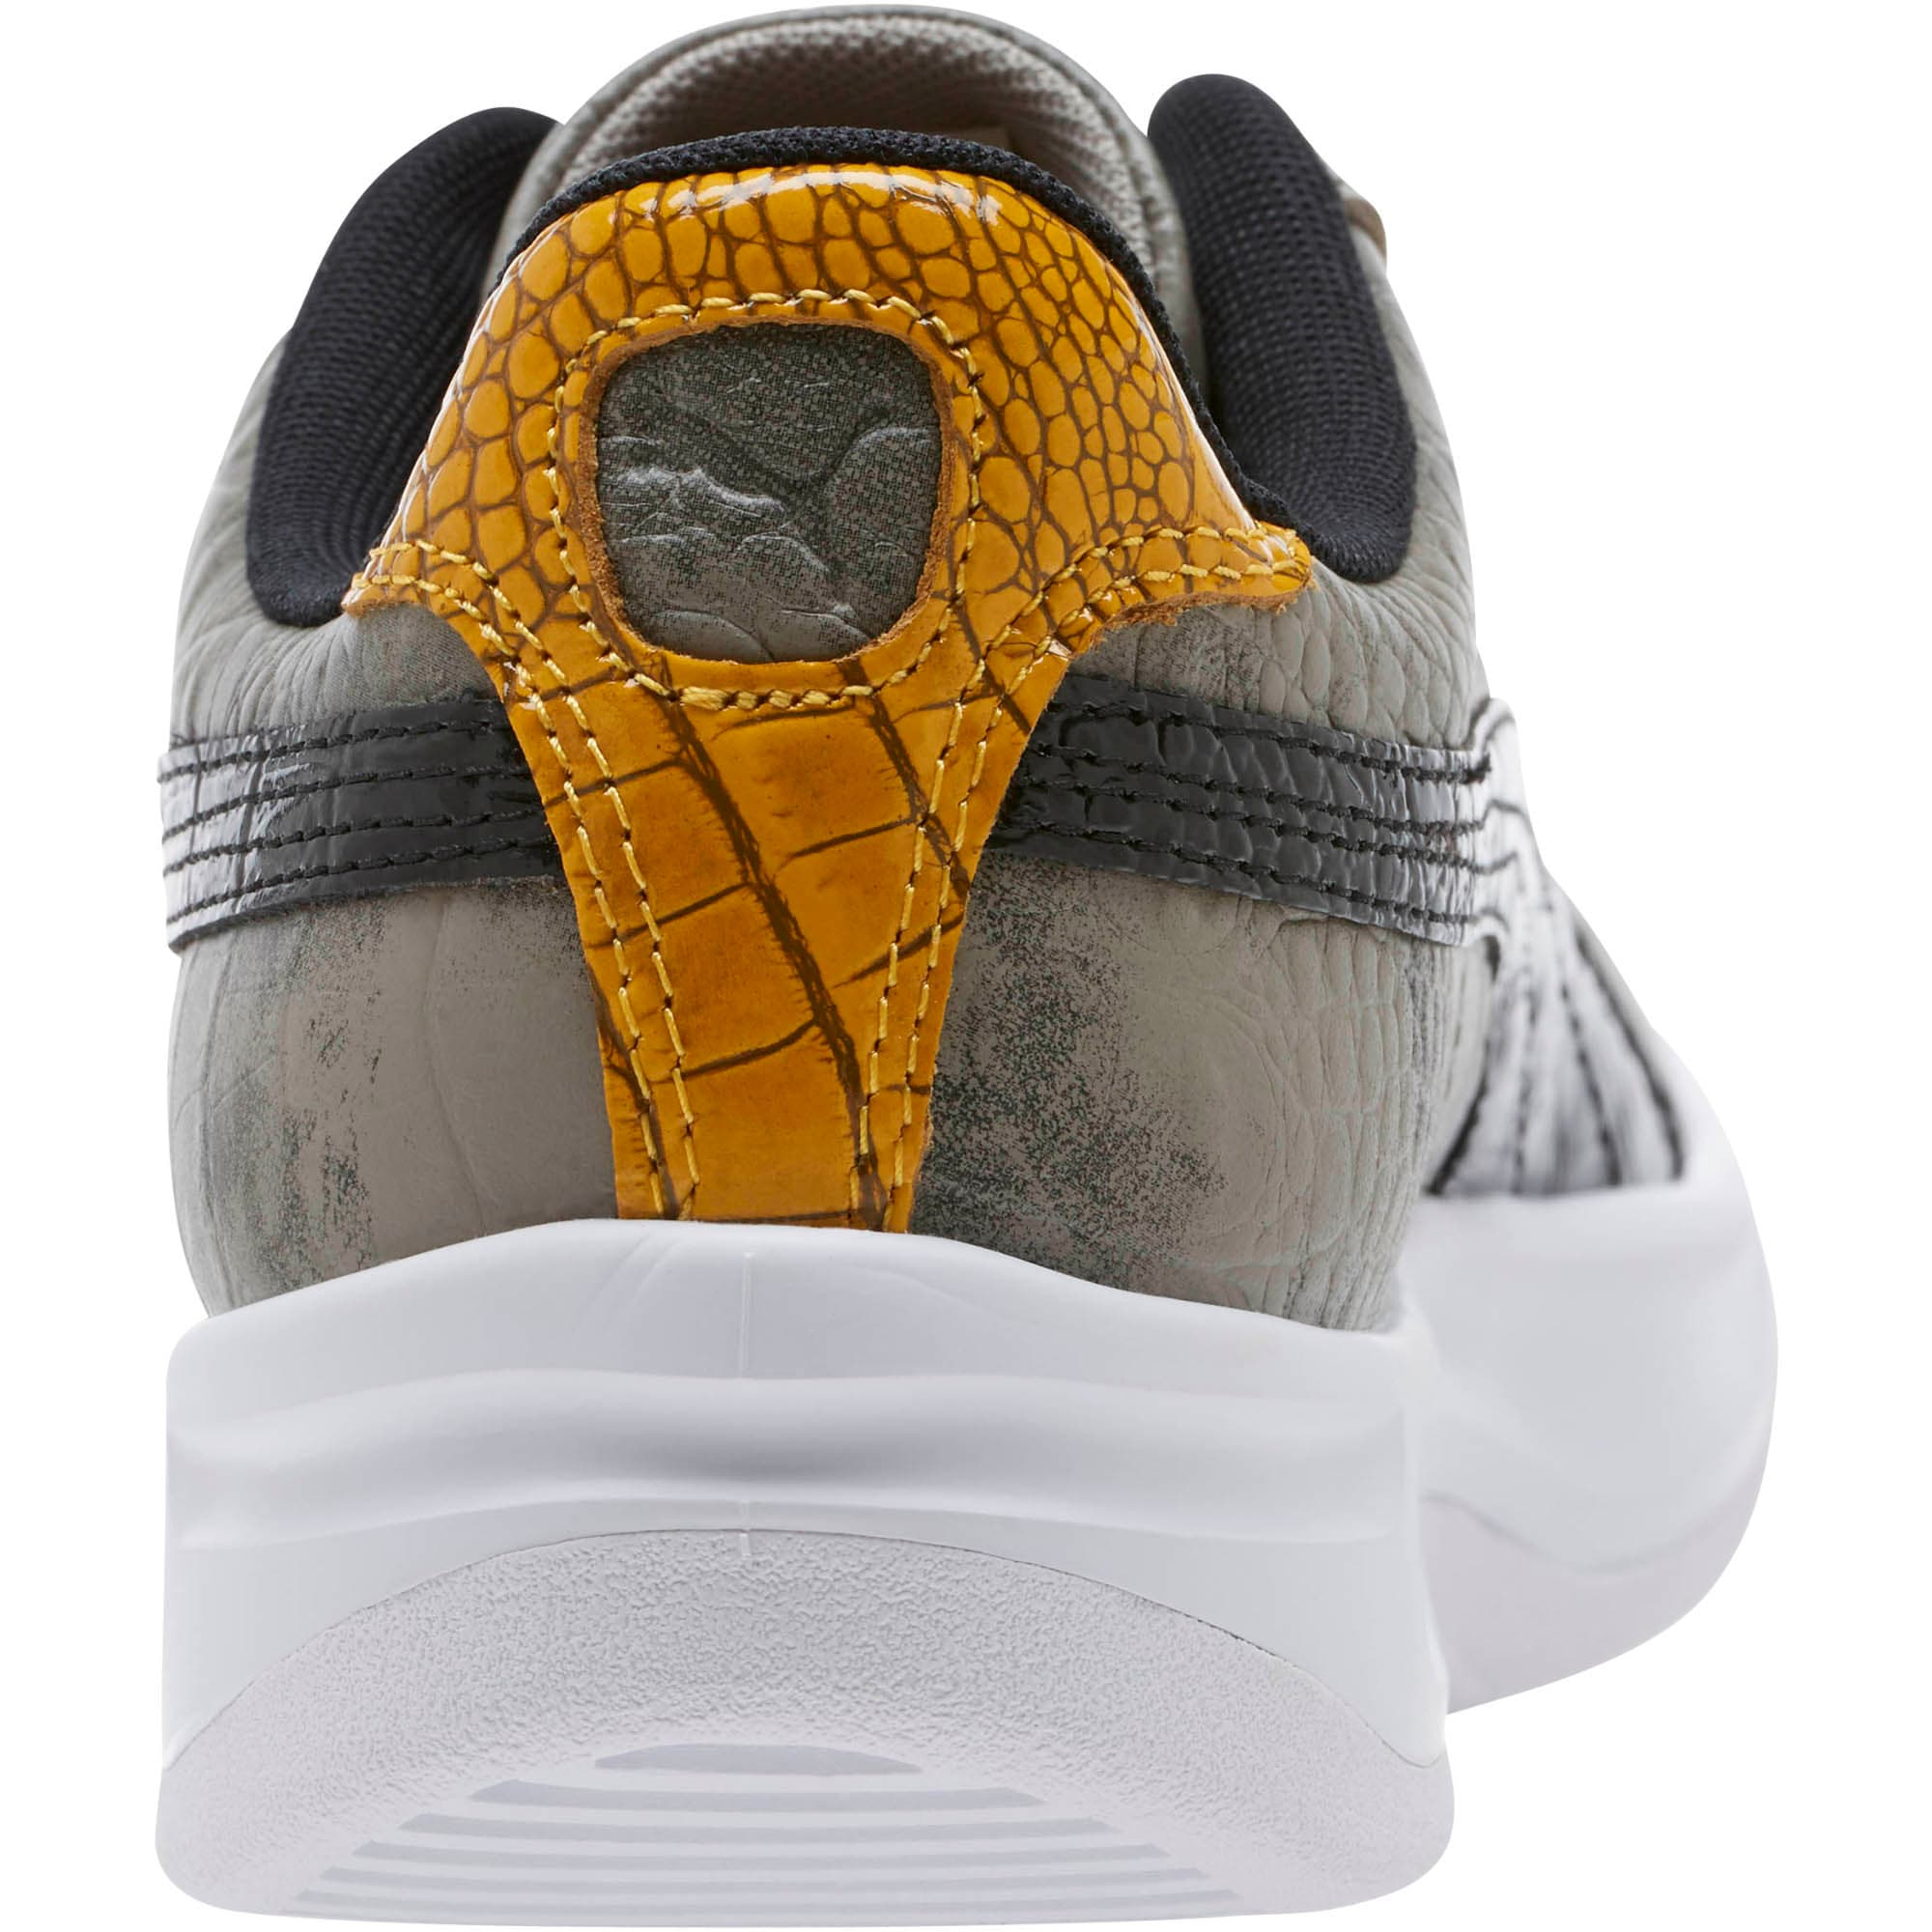 Thumbnail 4 of GV Special+ Gator Gray Men's Sneakers, Elephant Skin-Puma Black, medium